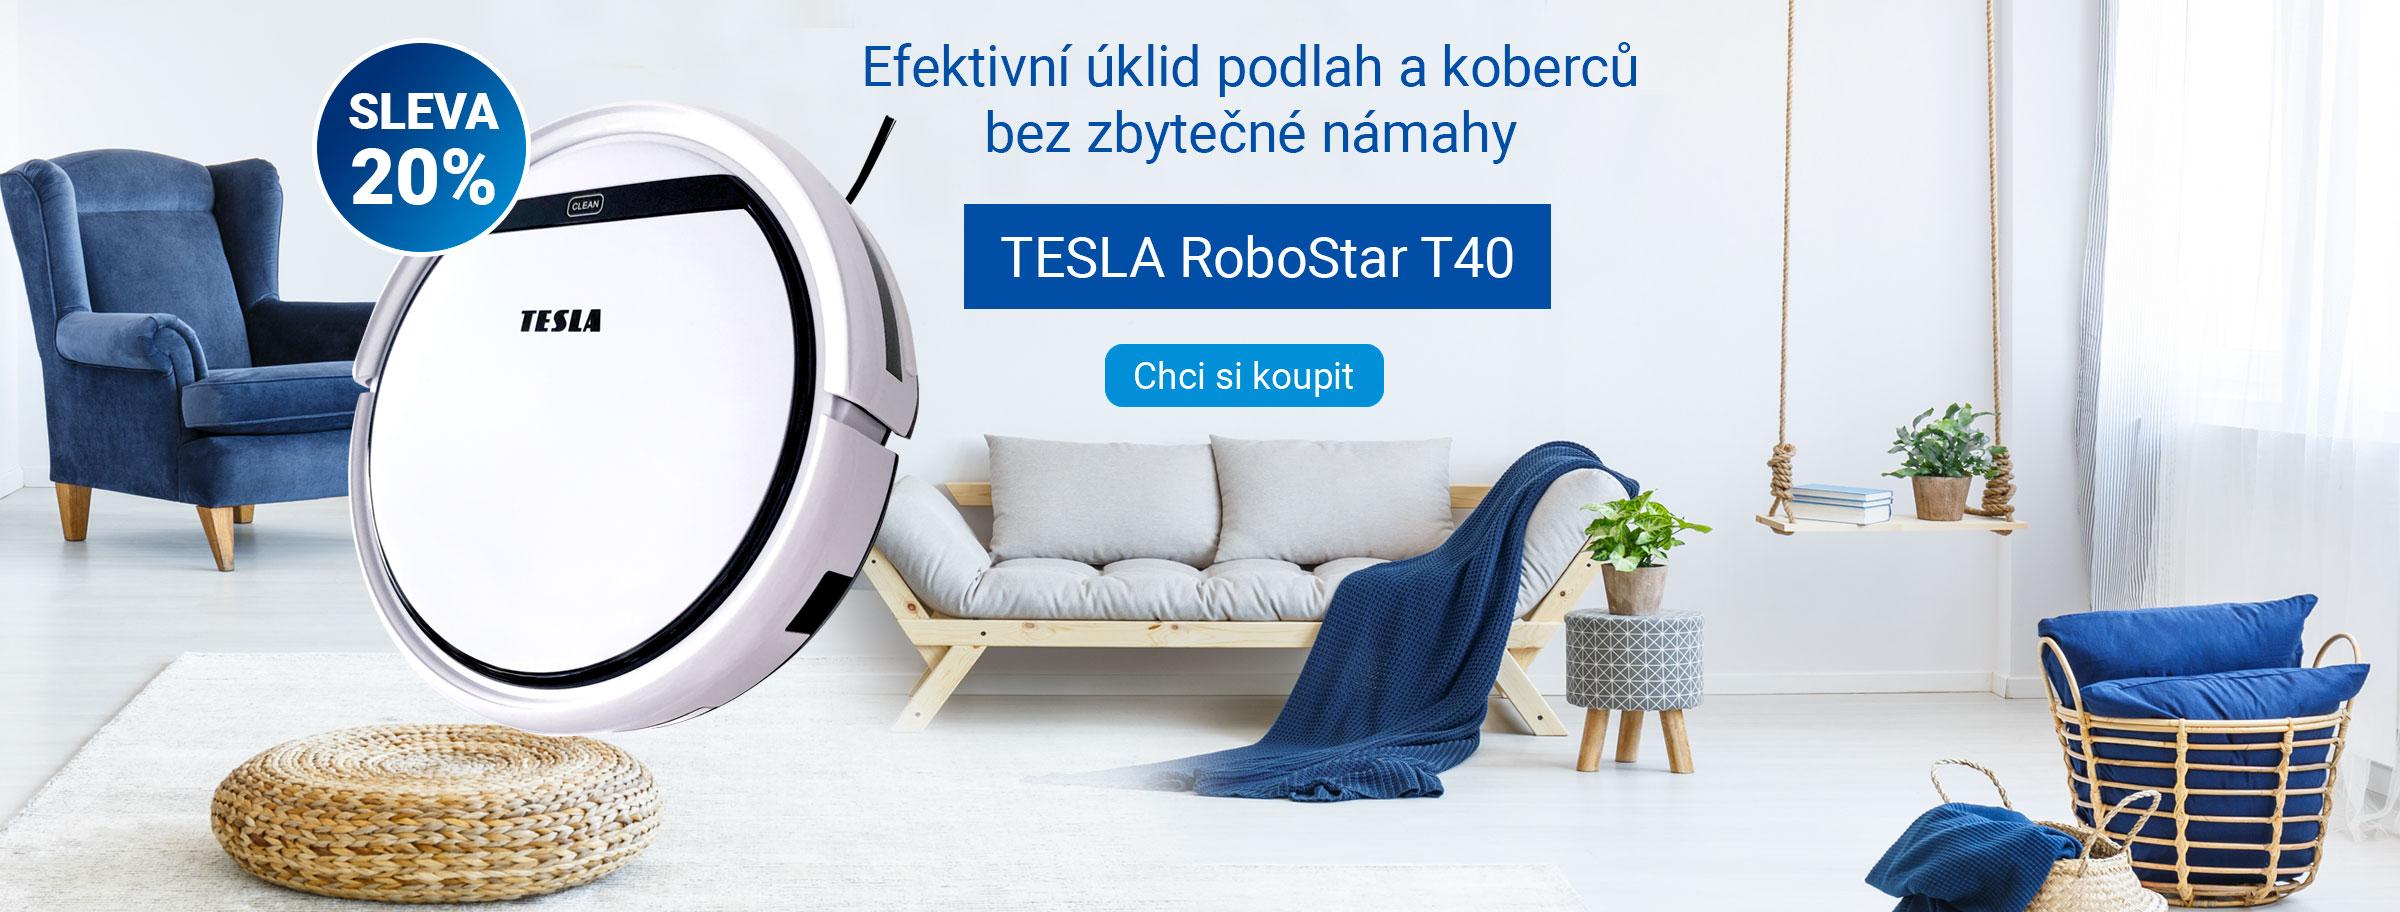 SLEVA 20% - TESLA RoboStar T40 - robotický vysavač